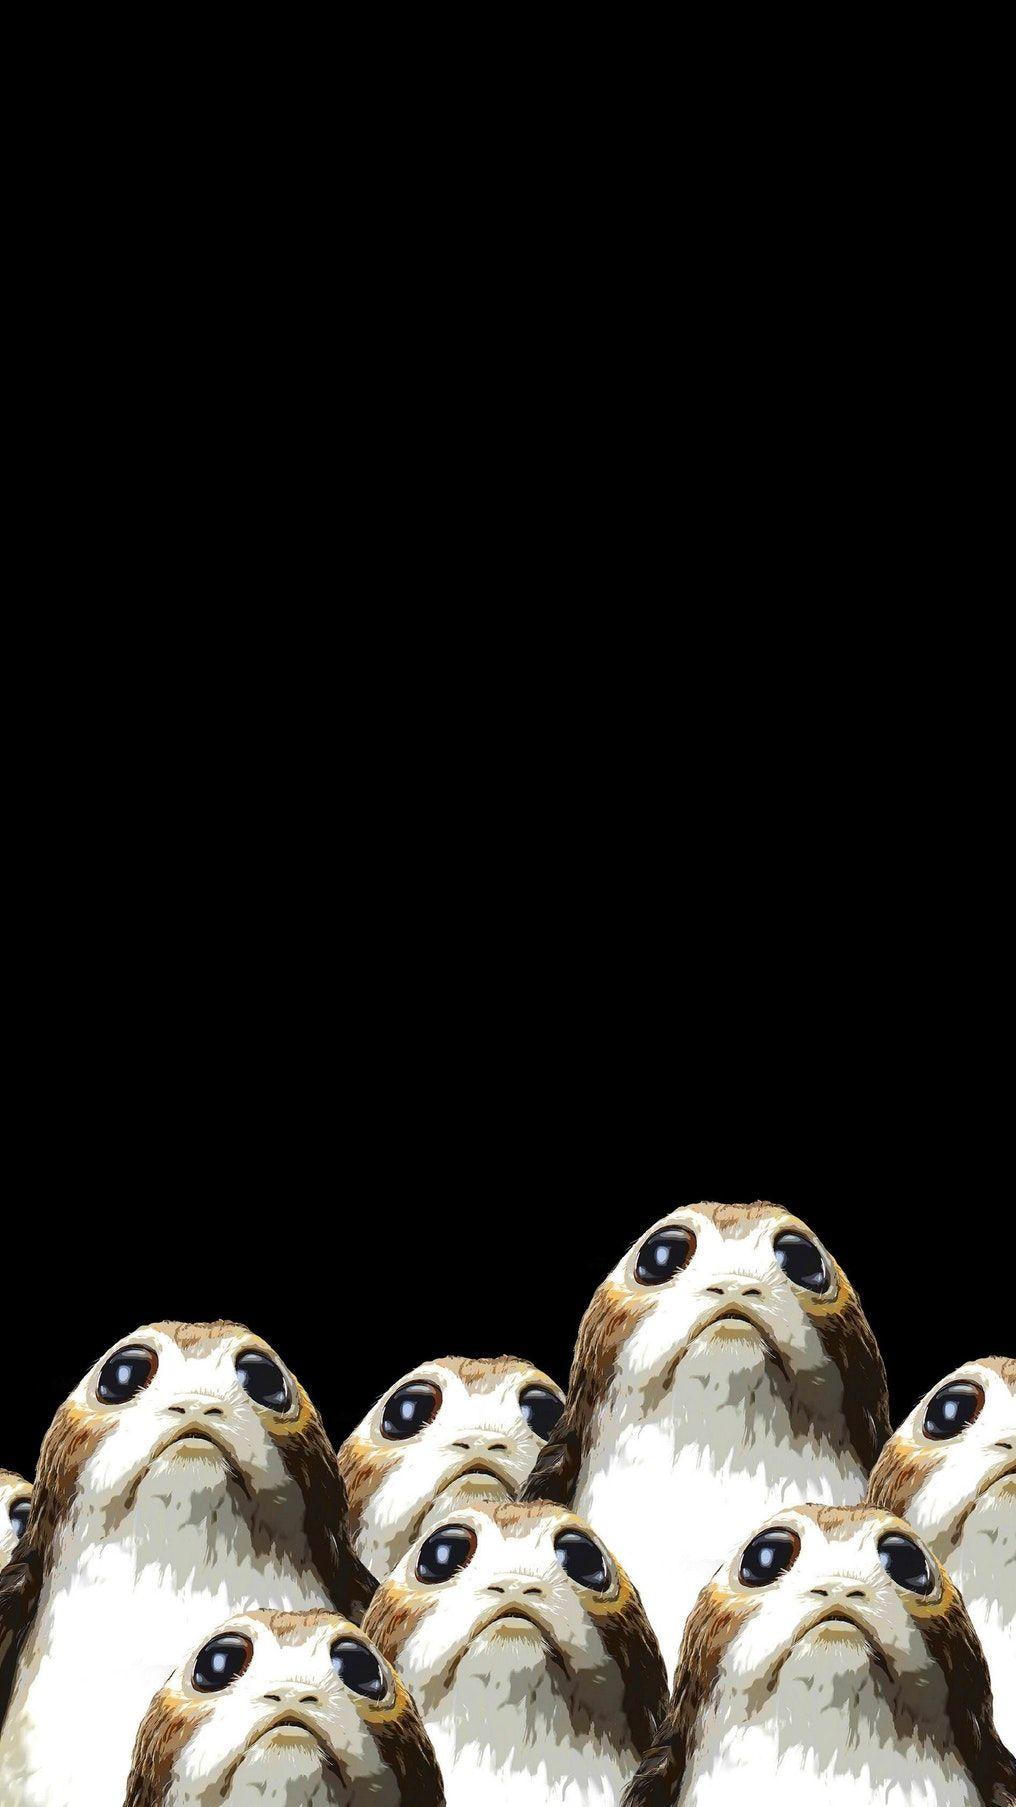 Star Wars The Last Jedi 2017 Phone Wallpaper Moviemania Star Wars Wallpaper Iphone Star Wars Wallpaper Star Wars Background